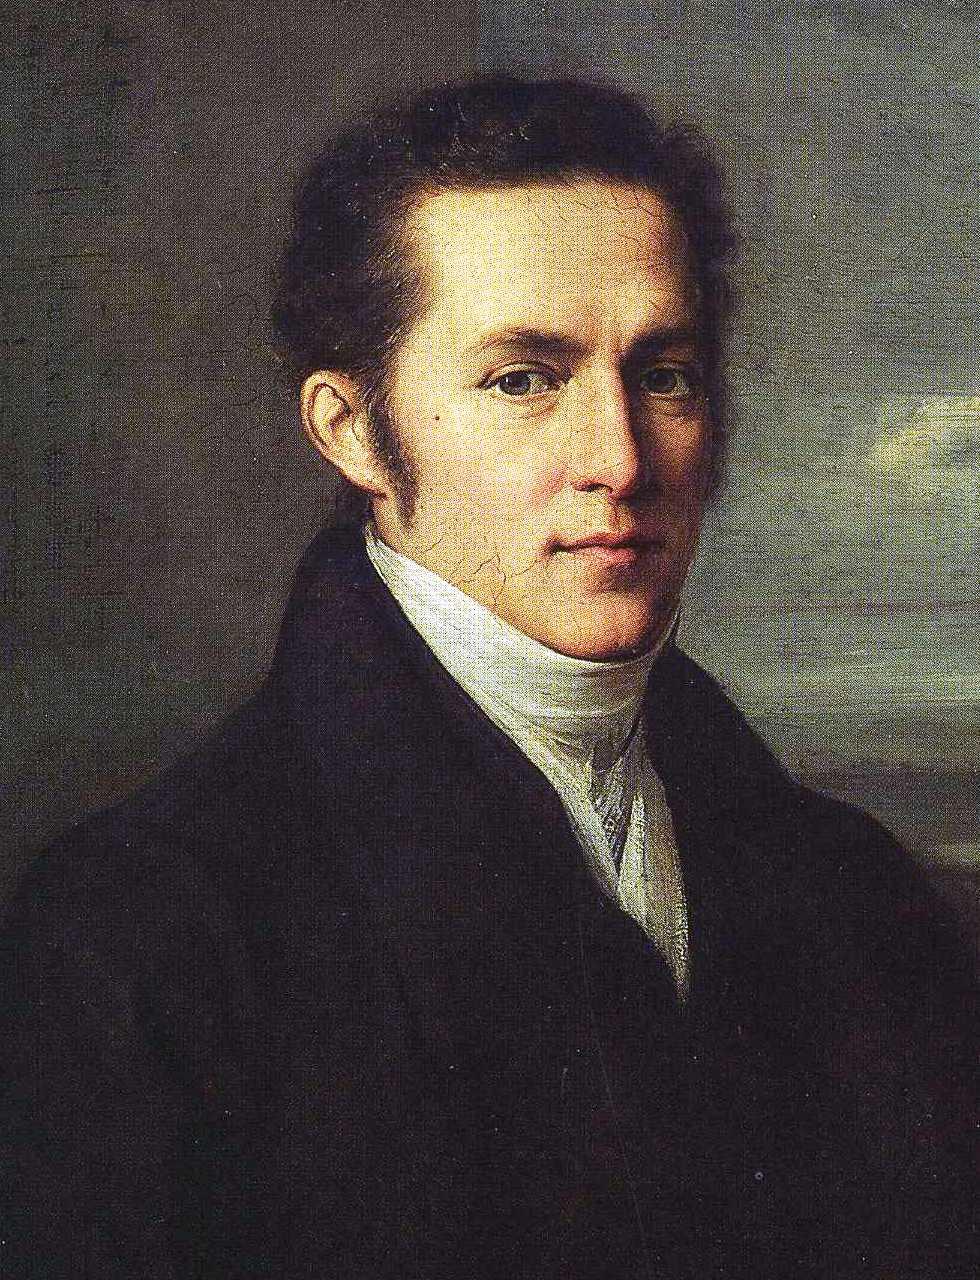 Carl Gustav Carus by Johann Carl Rössler